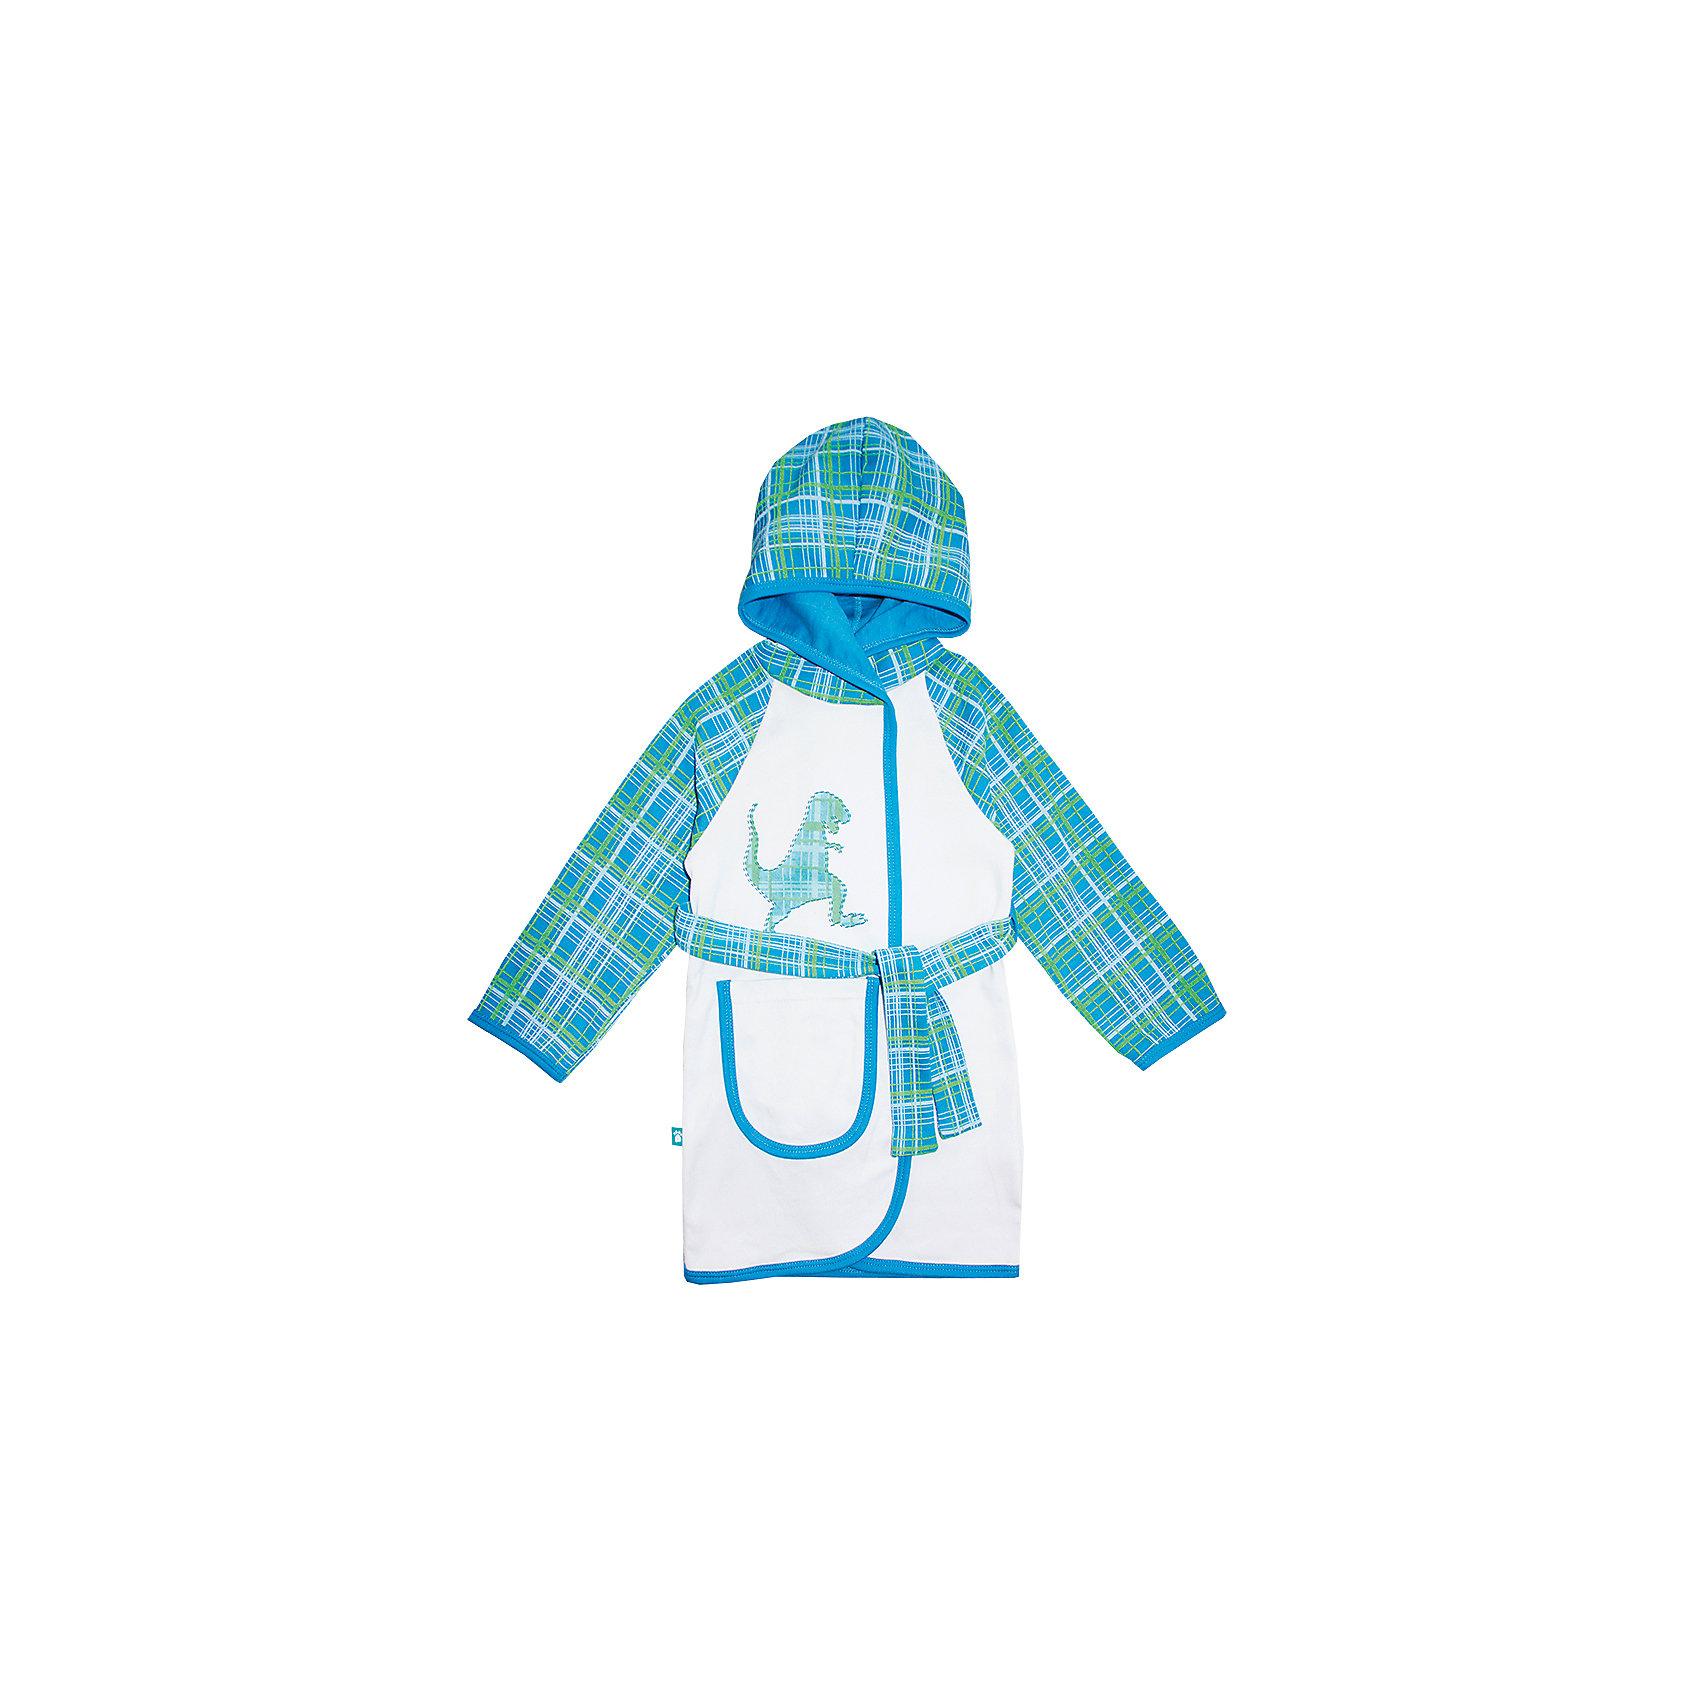 Халат для мальчика КотМарКотХалат для мальчика от известного бренда КотМарКот<br>Состав:<br>100% хлопок<br><br>Ширина мм: 143<br>Глубина мм: 20<br>Высота мм: 234<br>Вес г: 253<br>Цвет: синий<br>Возраст от месяцев: 18<br>Возраст до месяцев: 24<br>Пол: Мужской<br>Возраст: Детский<br>Размер: 92,134,98,104,110,116,122,128<br>SKU: 4873270